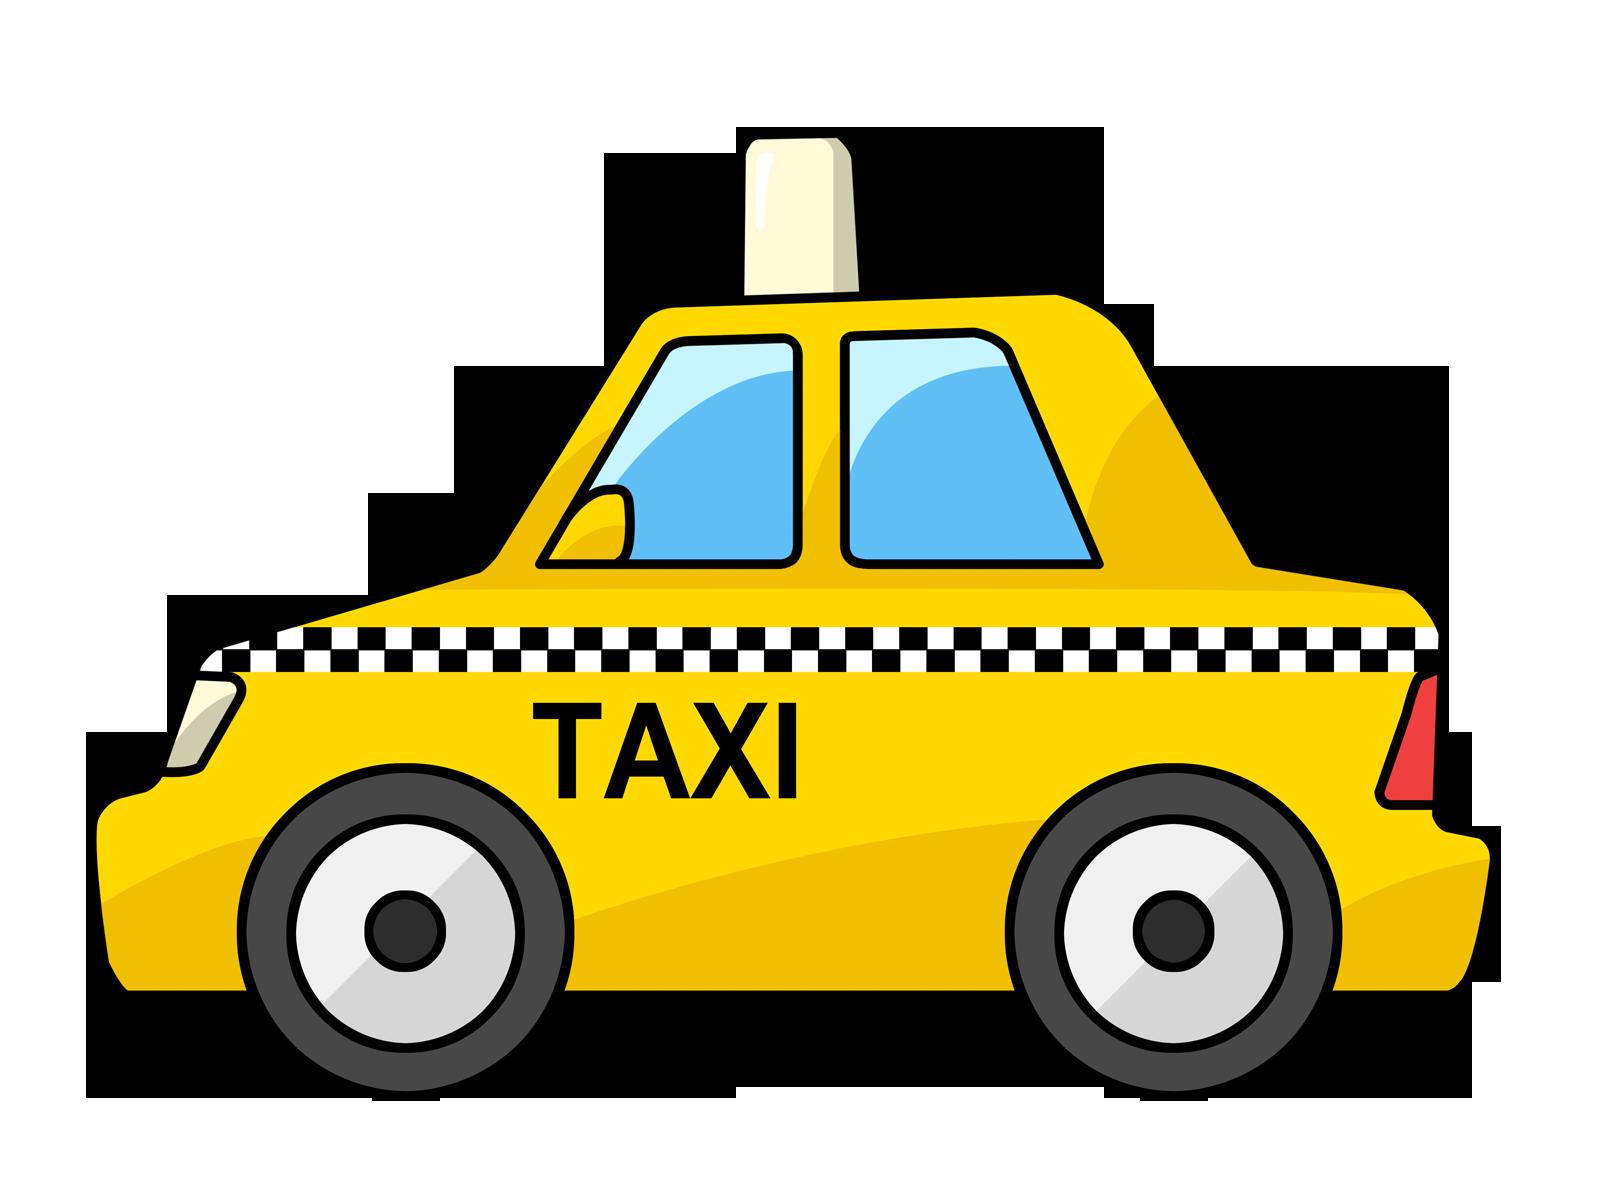 Cab clipart: yellow taxi cab clip art